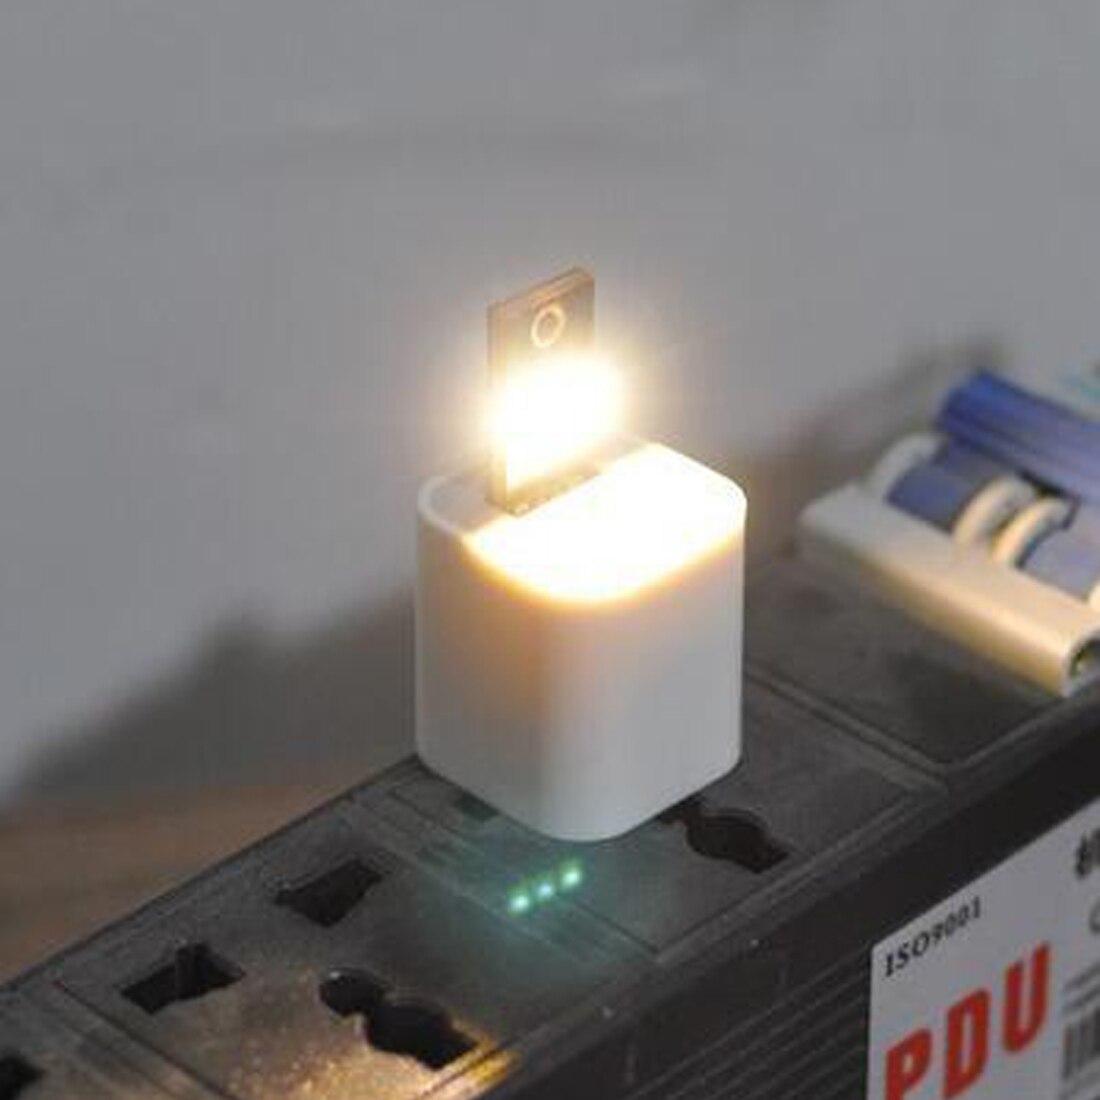 Mini Pocket Card Lamp Portable USB Power 2PCS LED Night Lamp Keychain Night Light for Power Bank Computer LaptopMini Pocket Card Lamp Portable USB Power 2PCS LED Night Lamp Keychain Night Light for Power Bank Computer Laptop